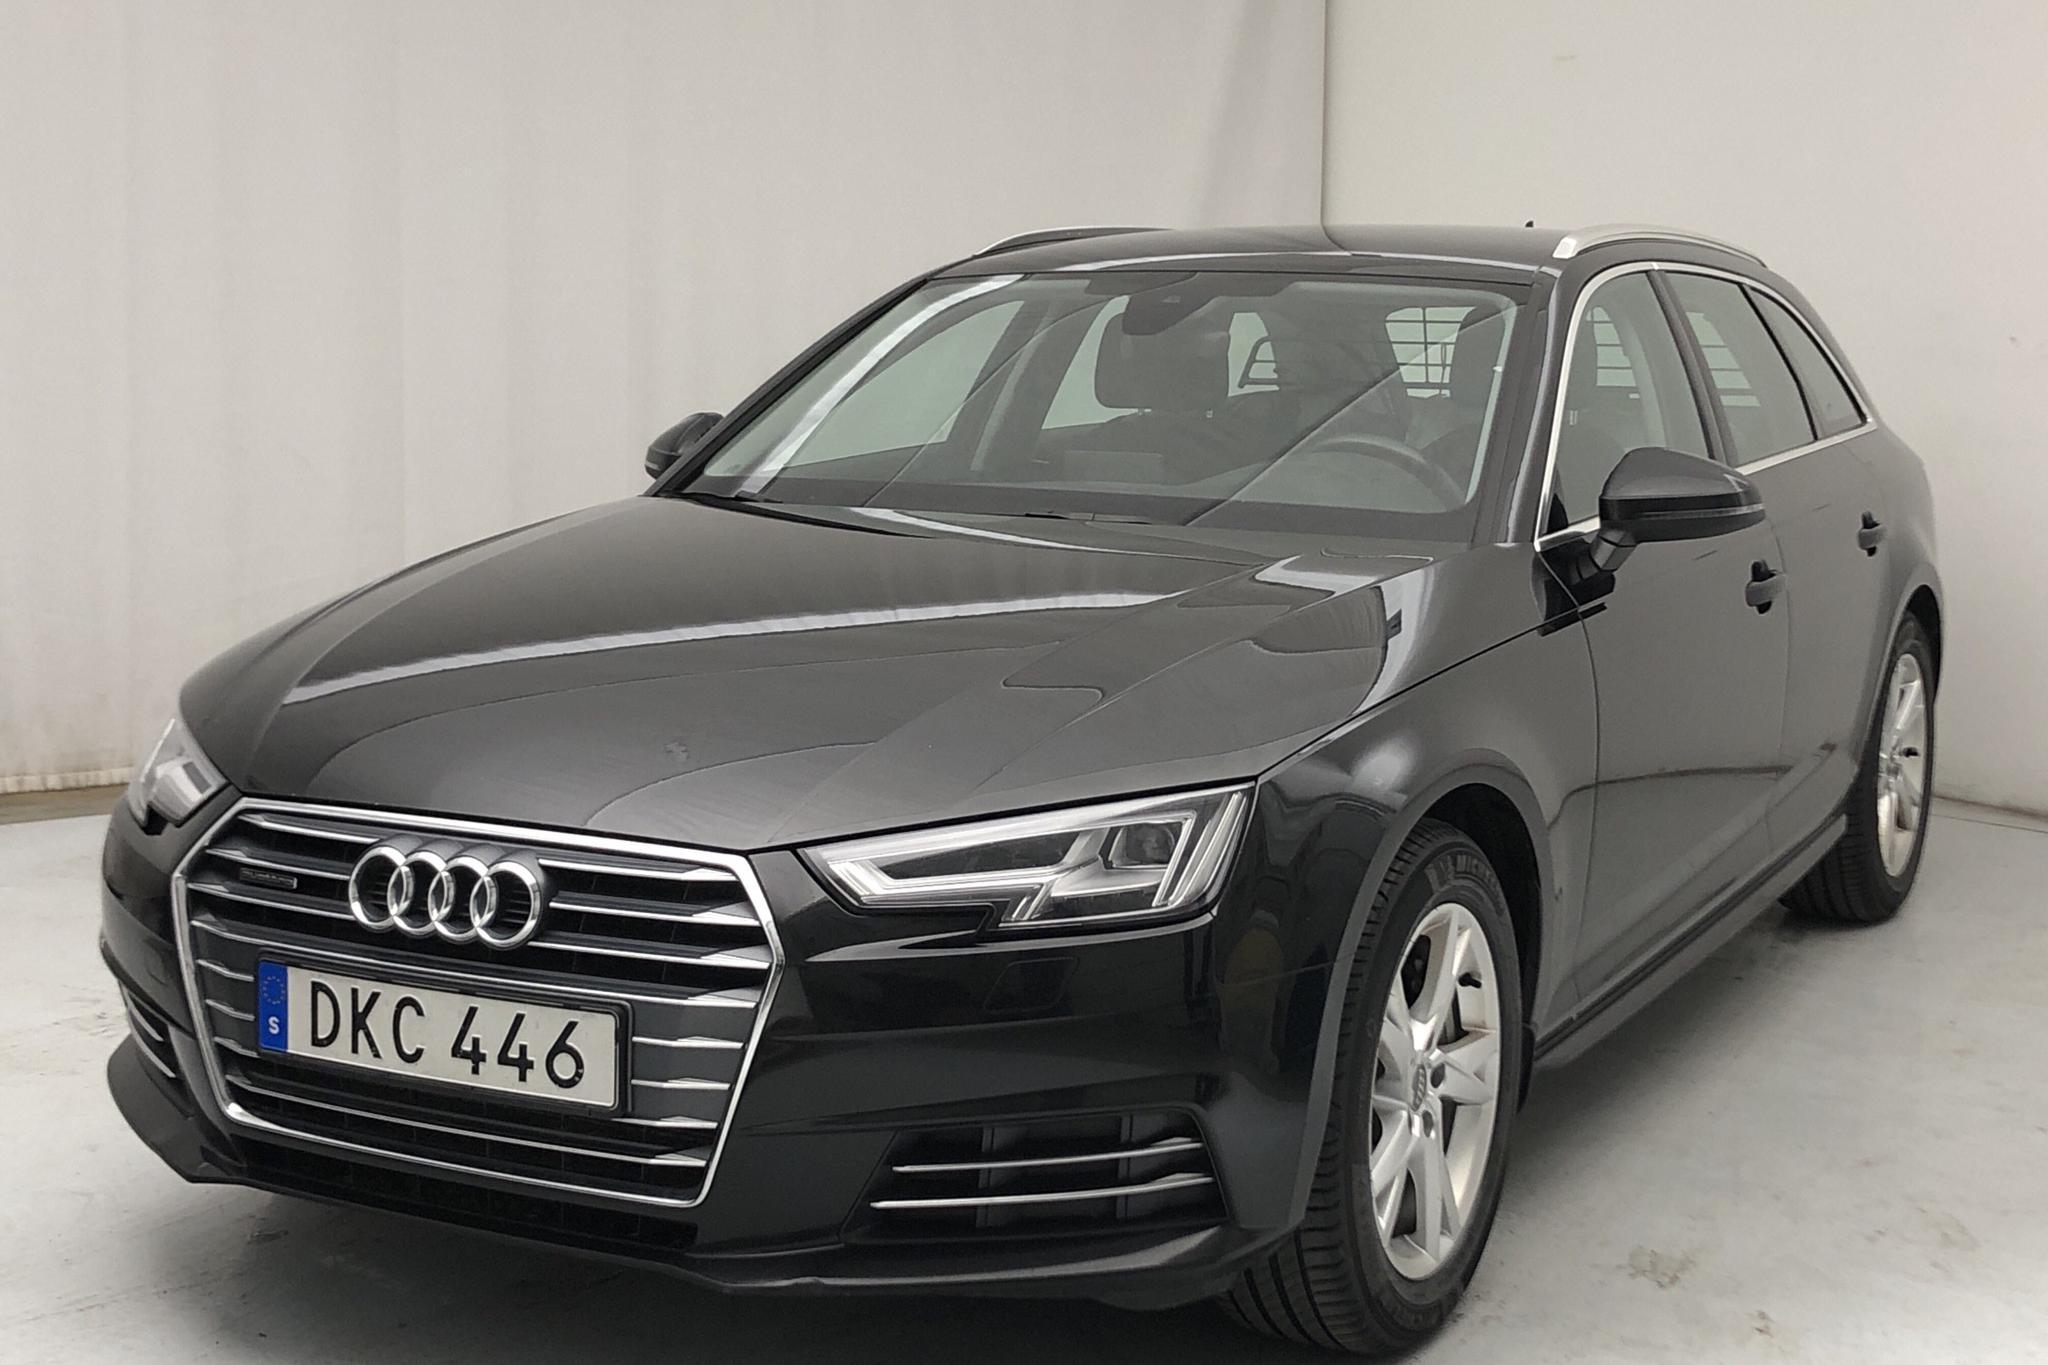 Audi A4 2.0 TDI Avant quattro (190hk) - 126 670 km - Manual - black - 2018